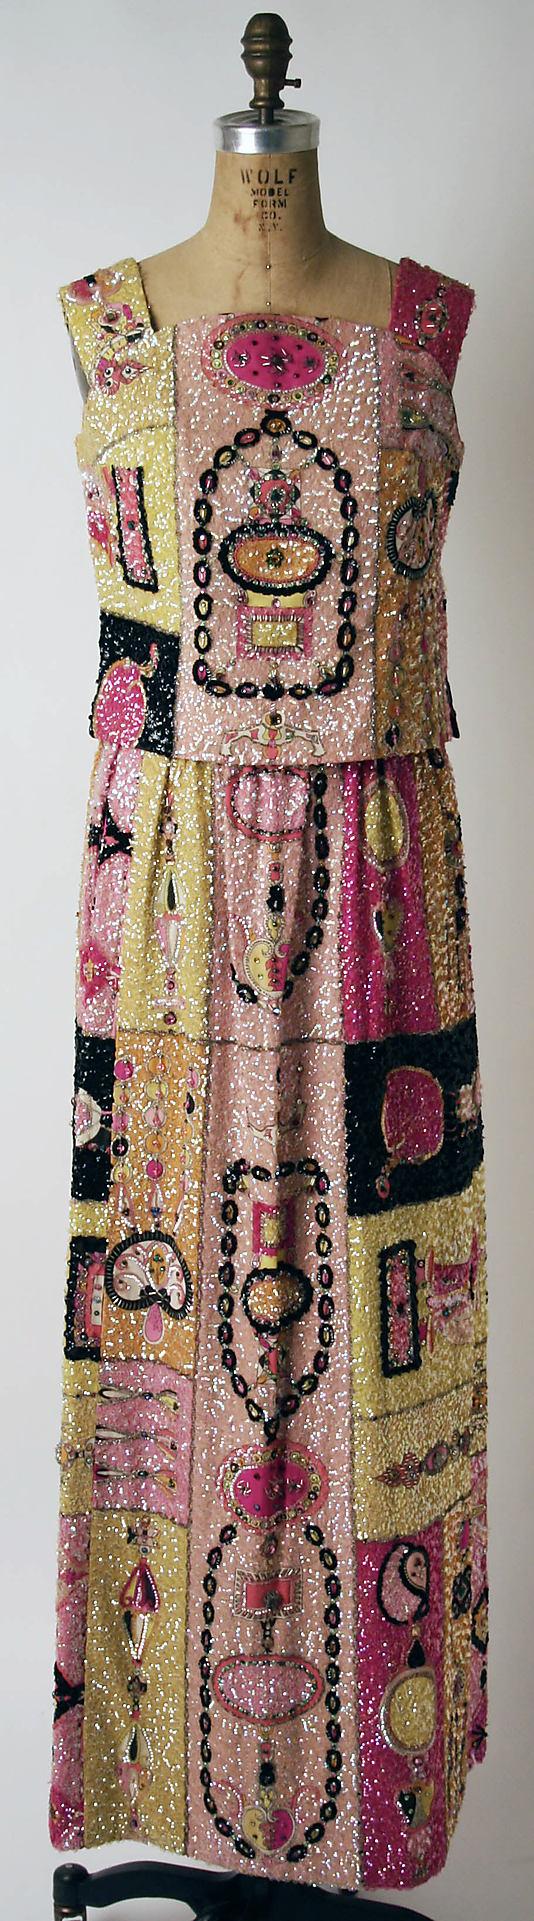 Dress, Evening Emilio Pucci, Fall/winter 1964–65 silk ...